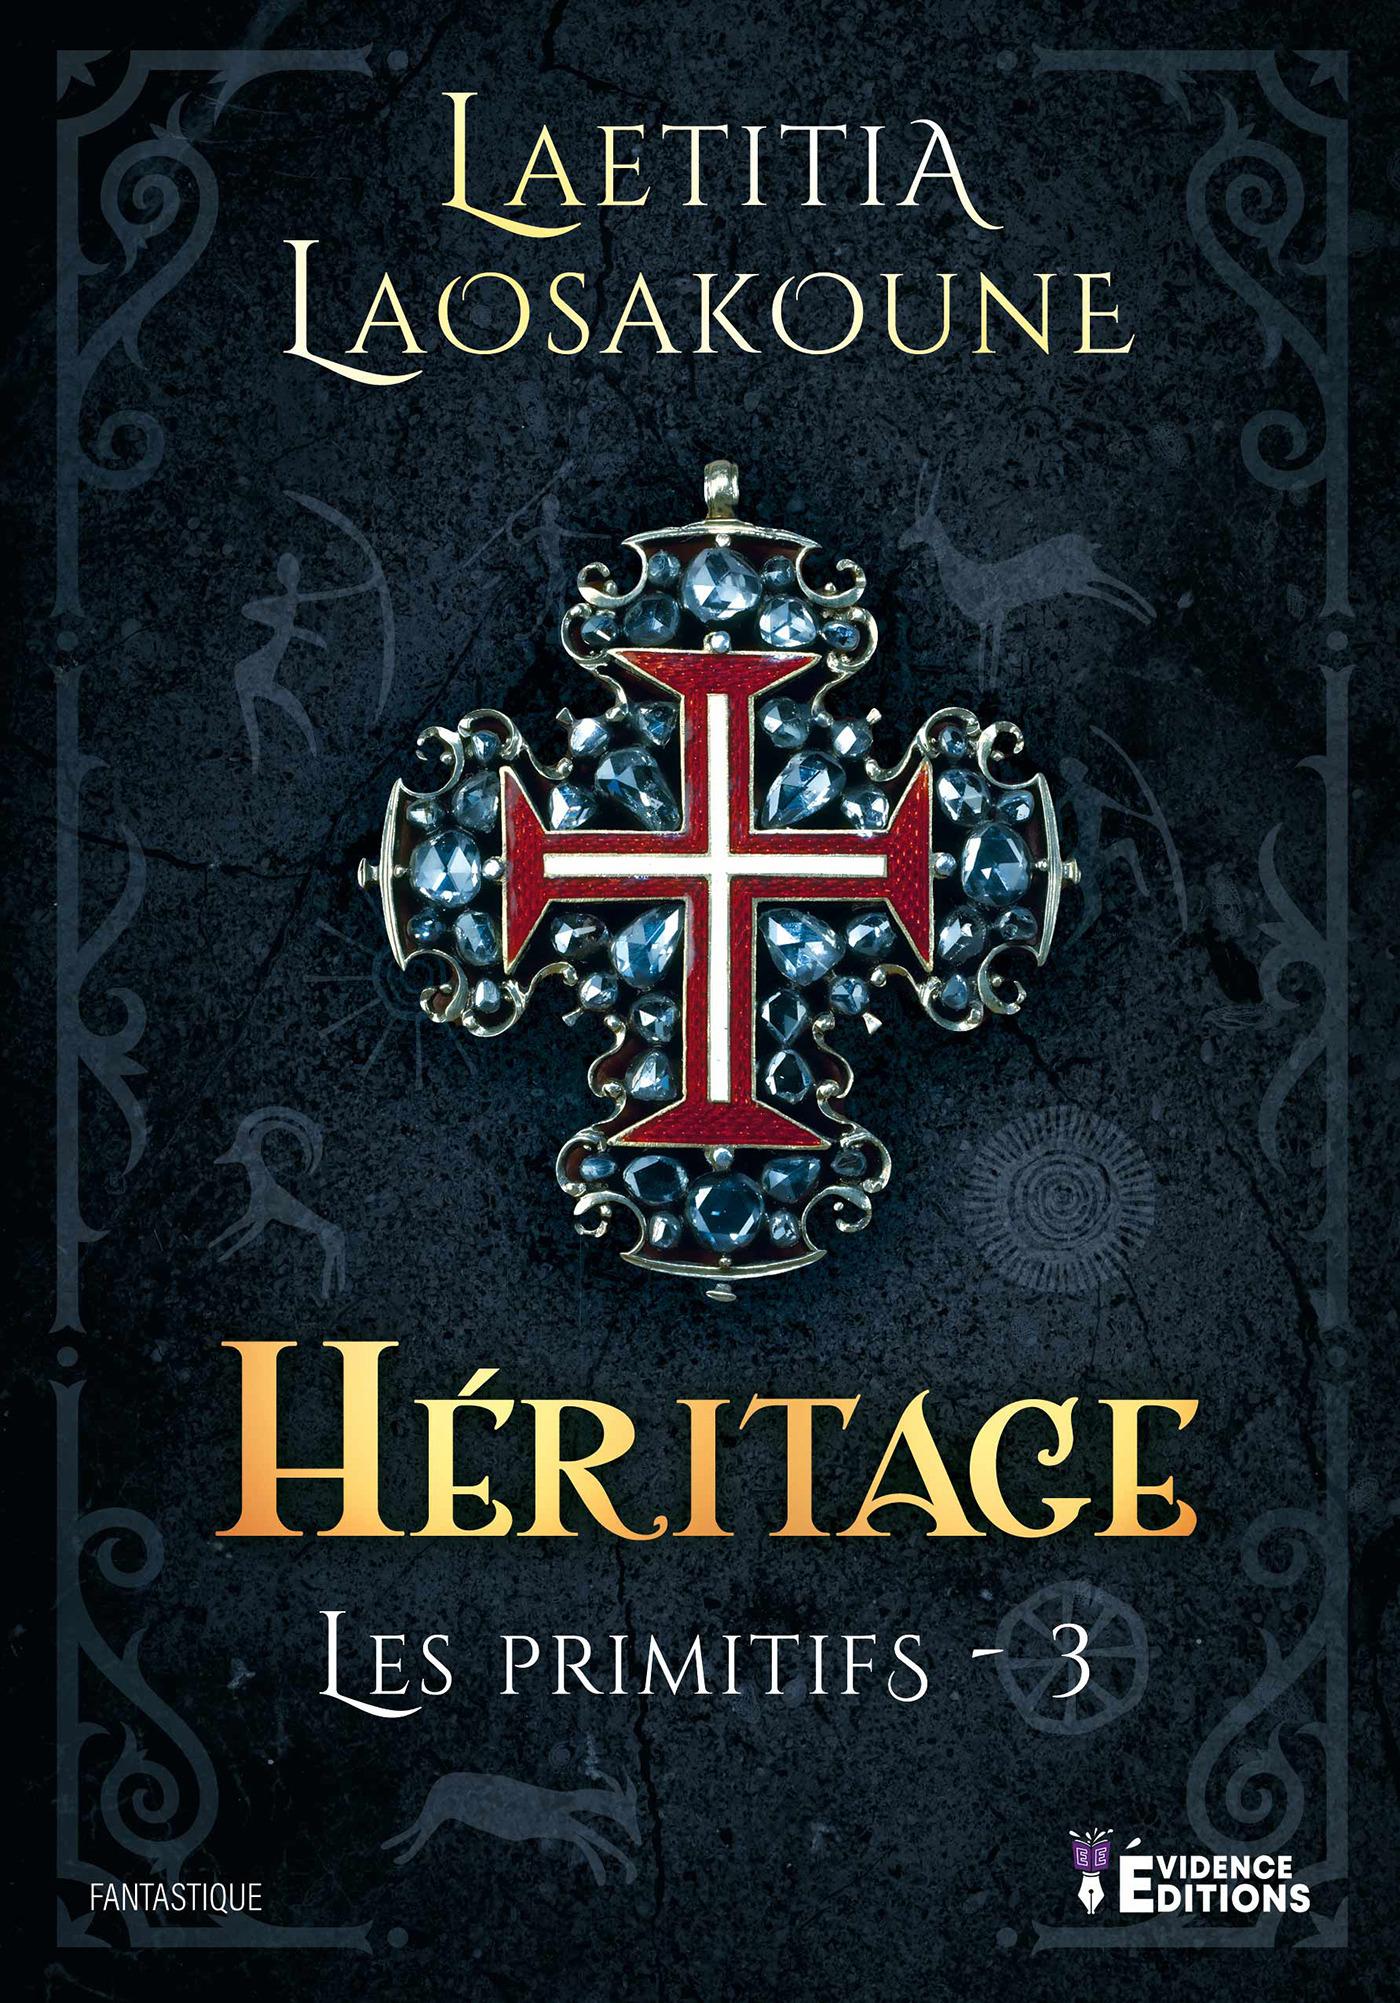 Les primitifs tome 3 - heritage